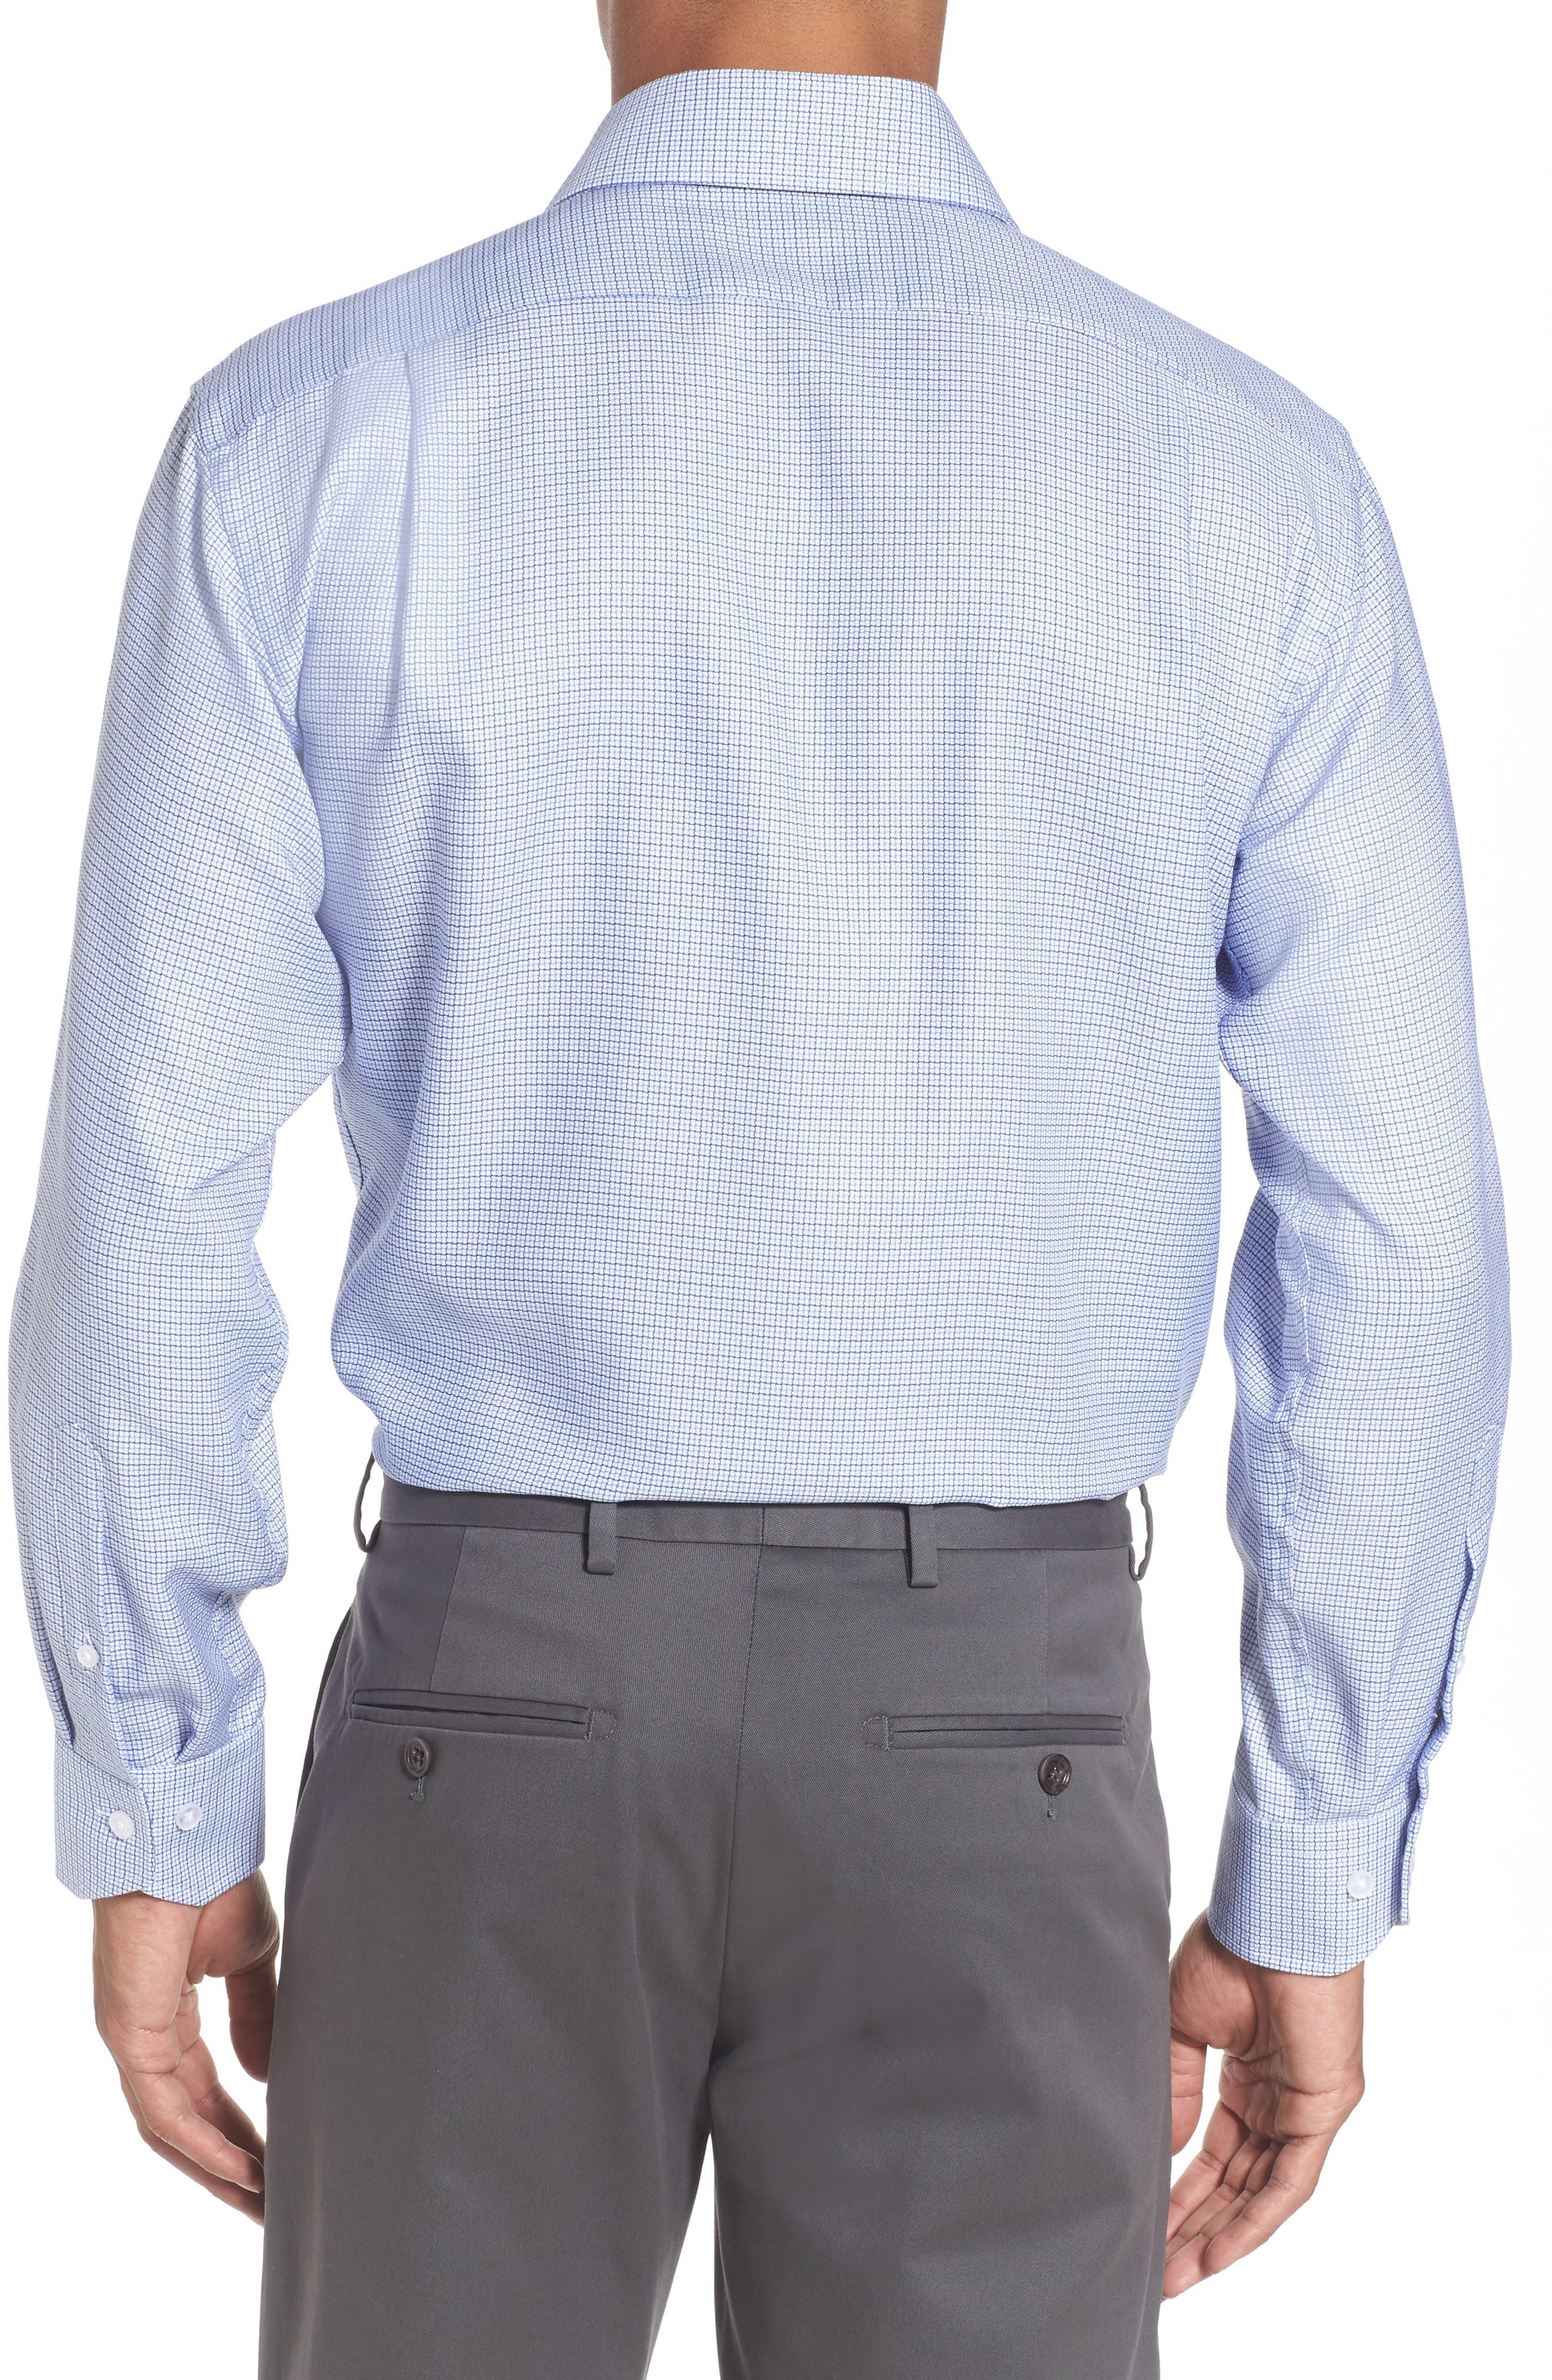 Trim Fit Check Dress Shirt,                             Alternate thumbnail 2, color,                             Light Blue/ Navy